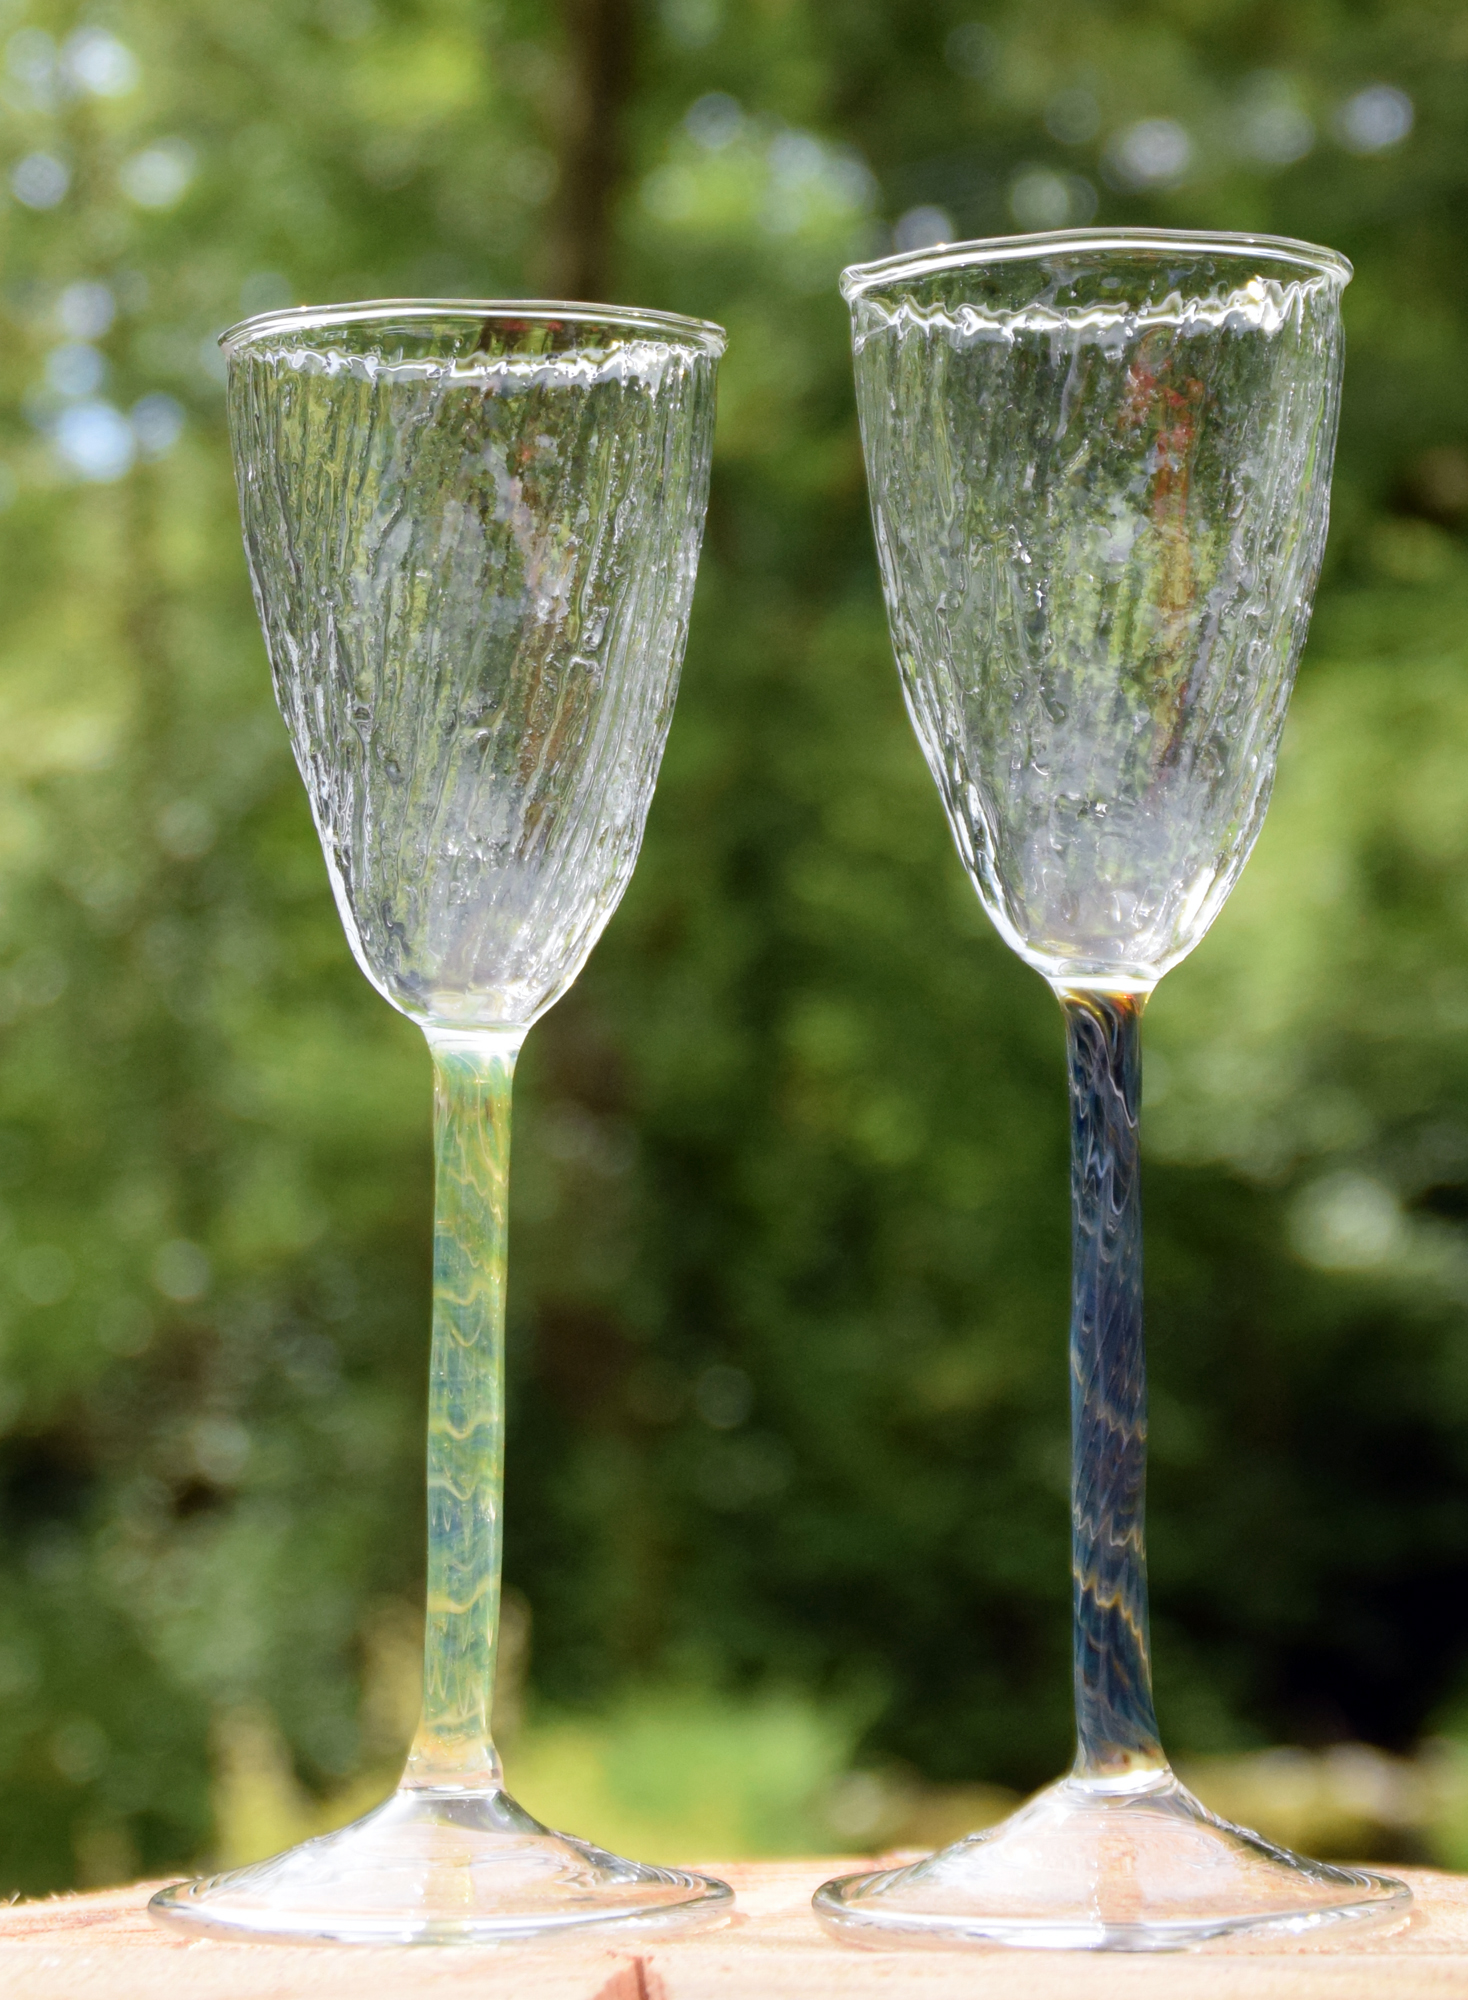 Textured prosecco glass